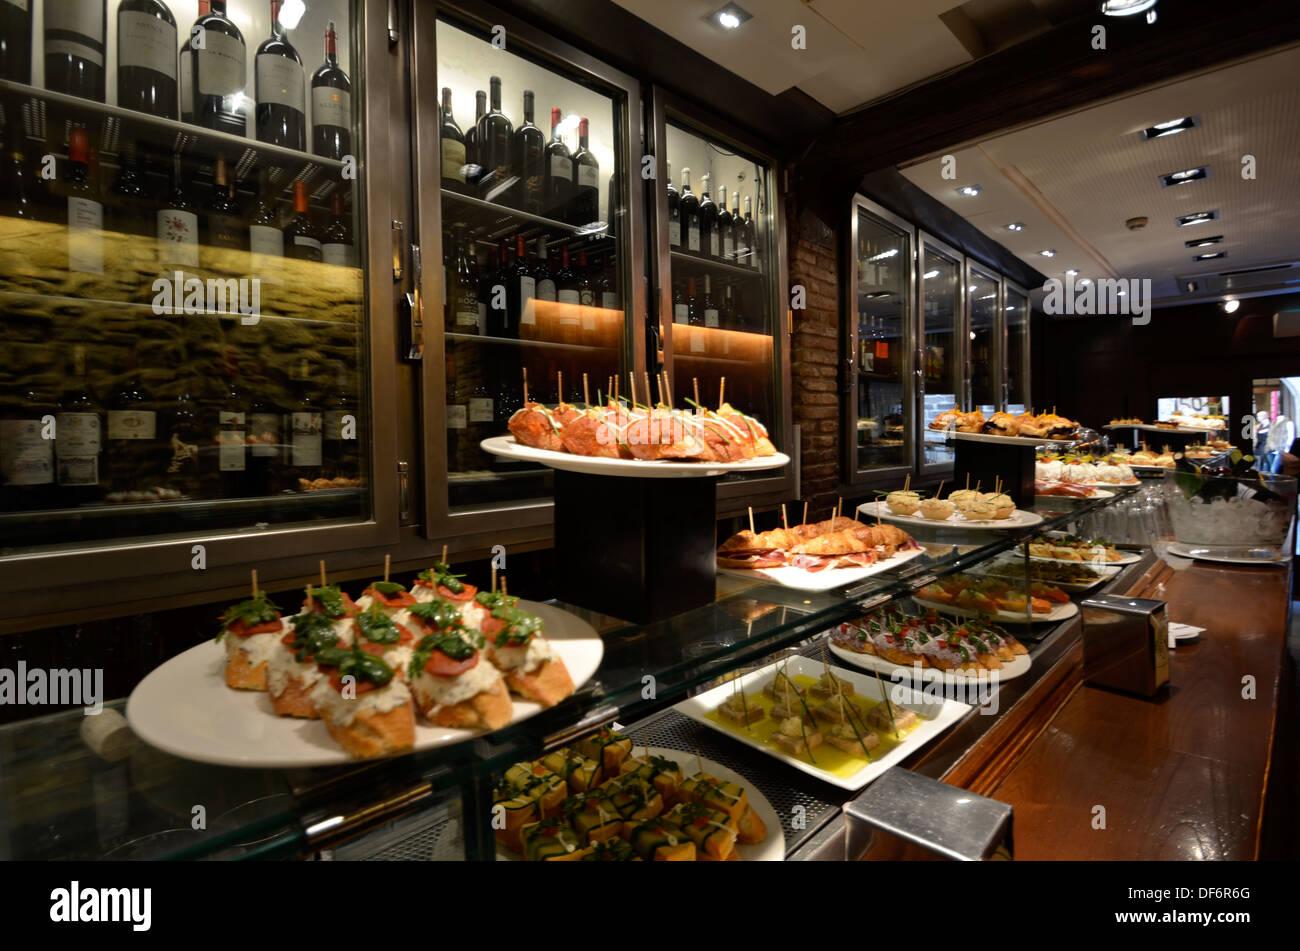 Europe, Spain, Barcelona, Bar, Tapas, Food Stock Photo: 61000872 - Alamy